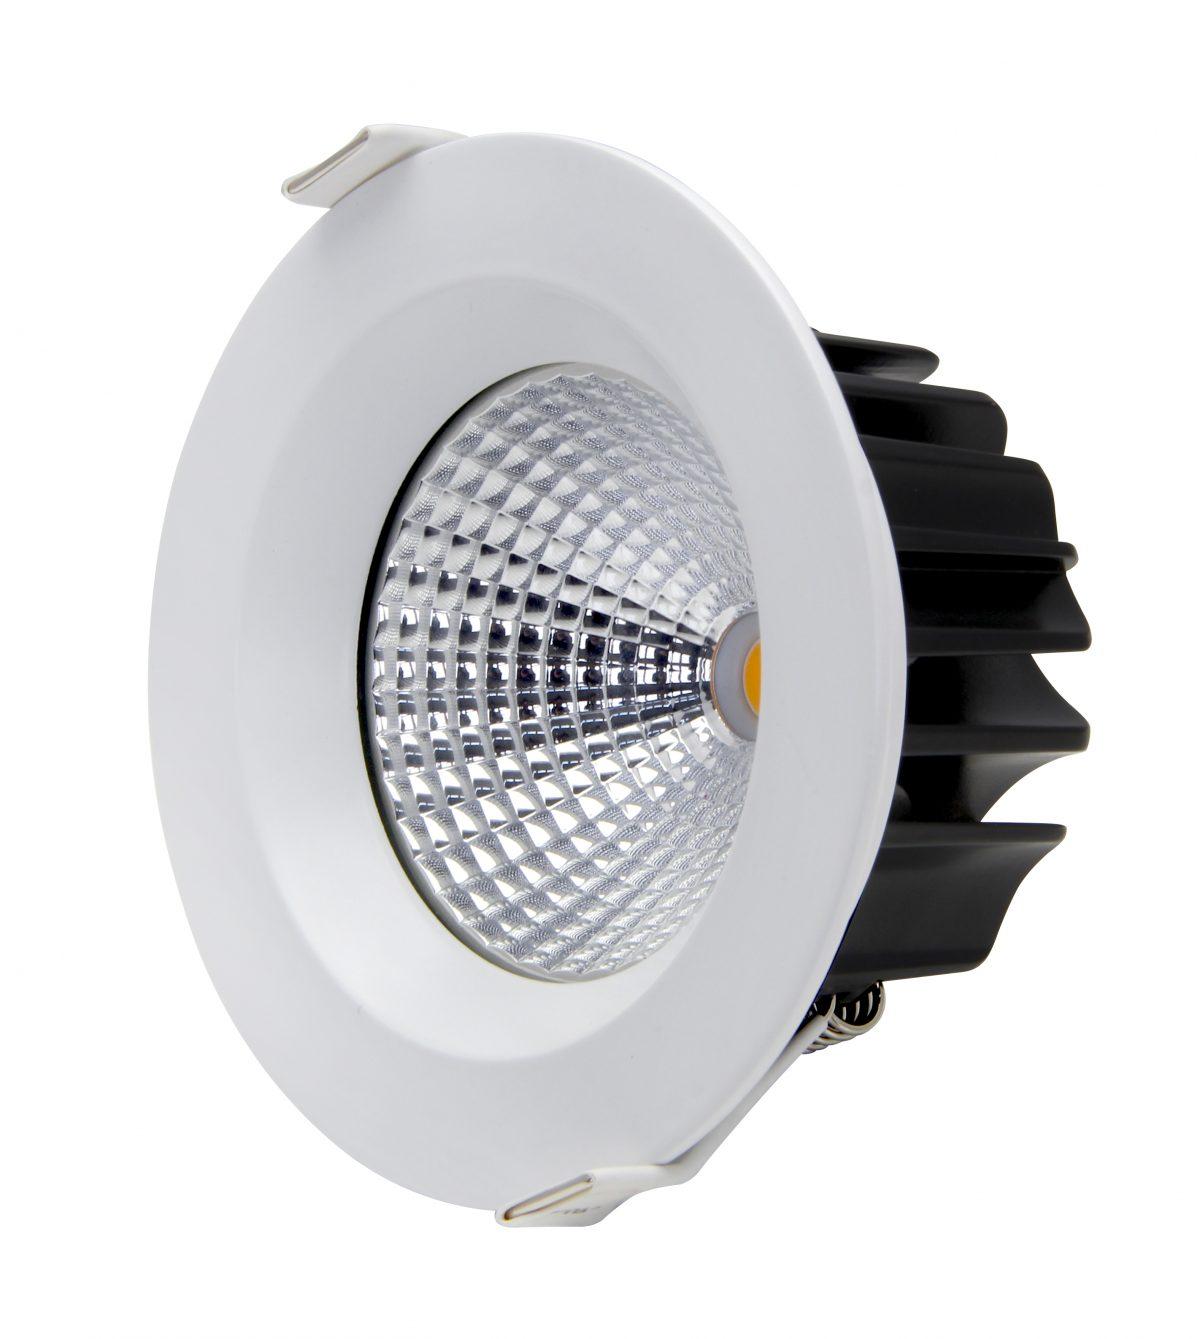 OPTIMA PRIME – 10W/18W/25W/35W External Driver RDL Series